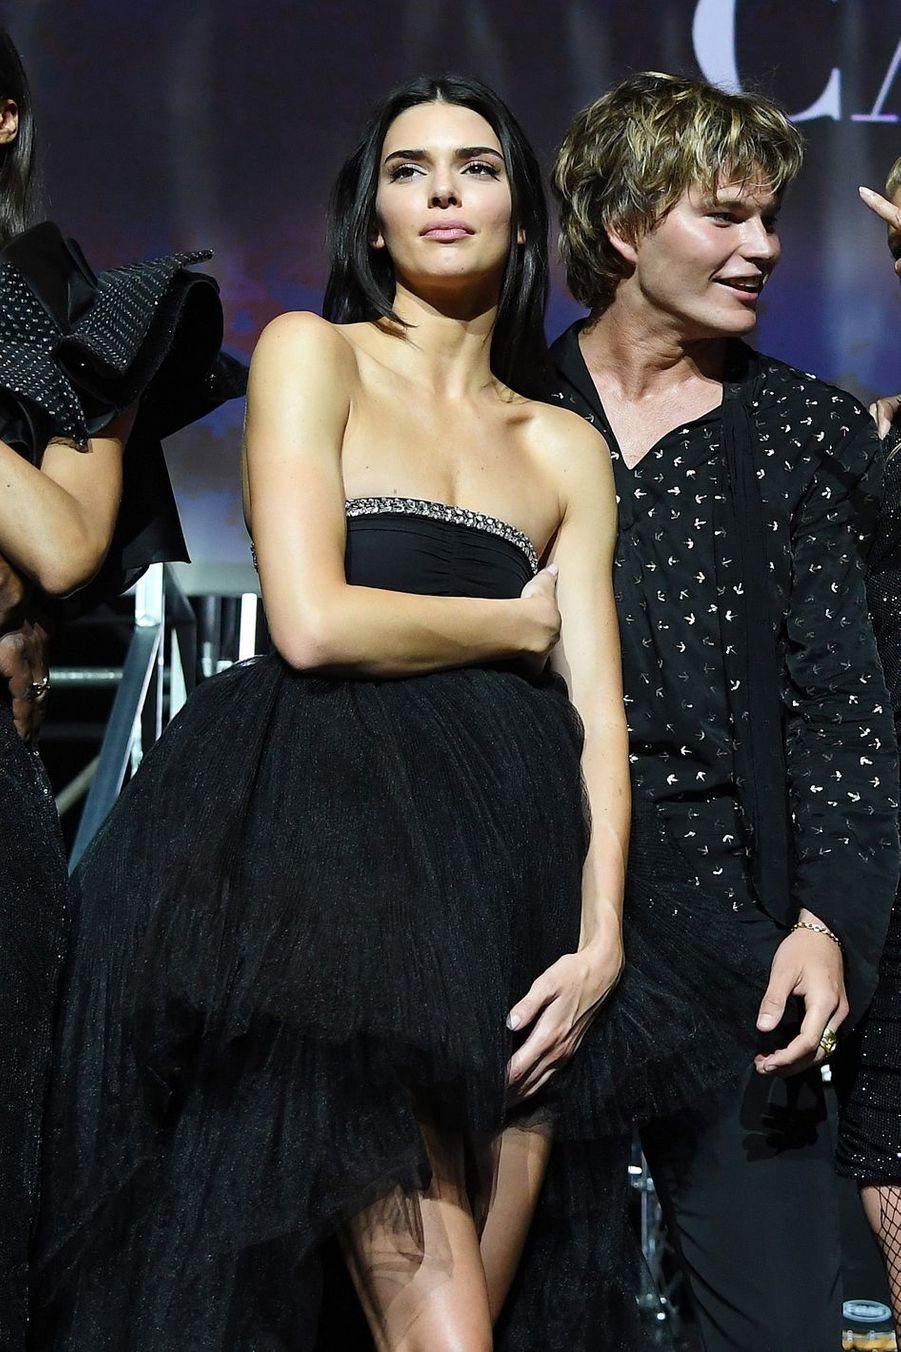 Kendall Jenner lors duGala de l'amFAR à Cannes, le 23 mai 2019